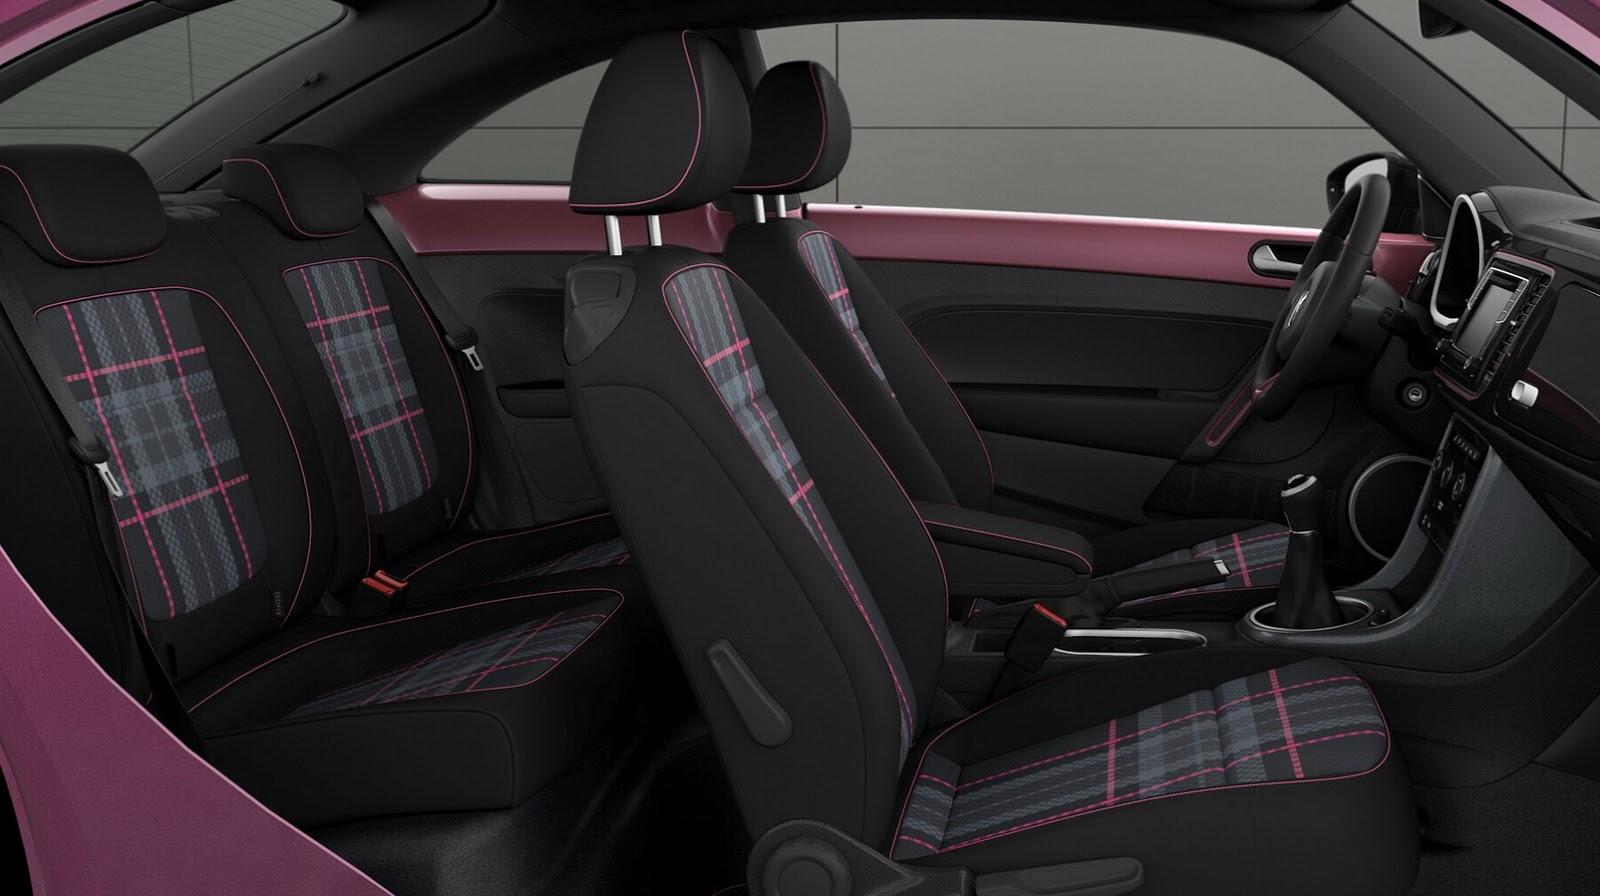 VW #PinkBeetle (interior)